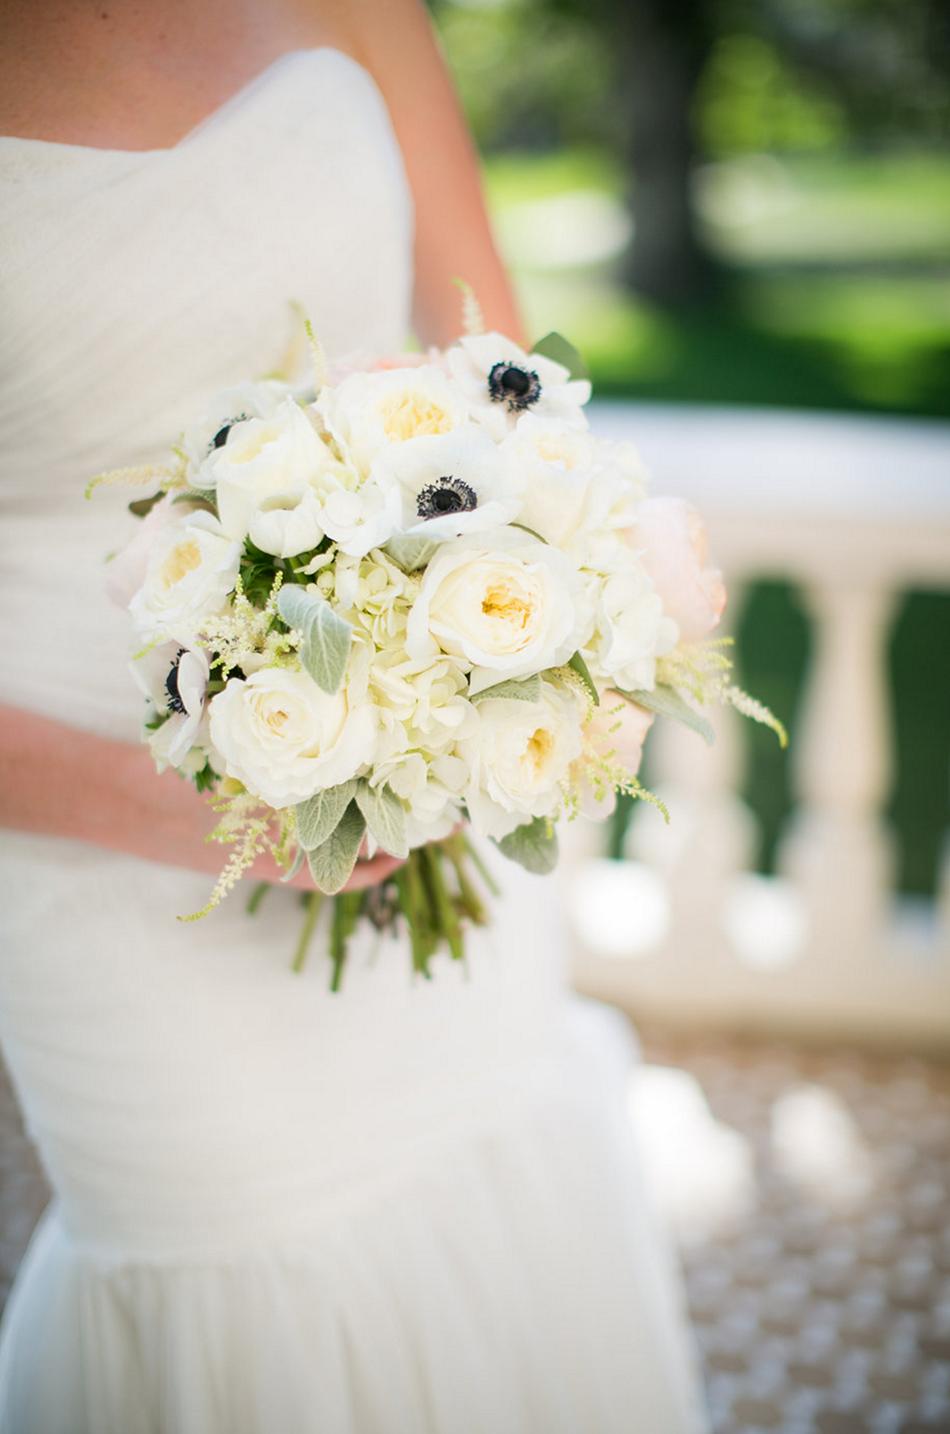 monique_lhuillier_denver_wedding12.jpg